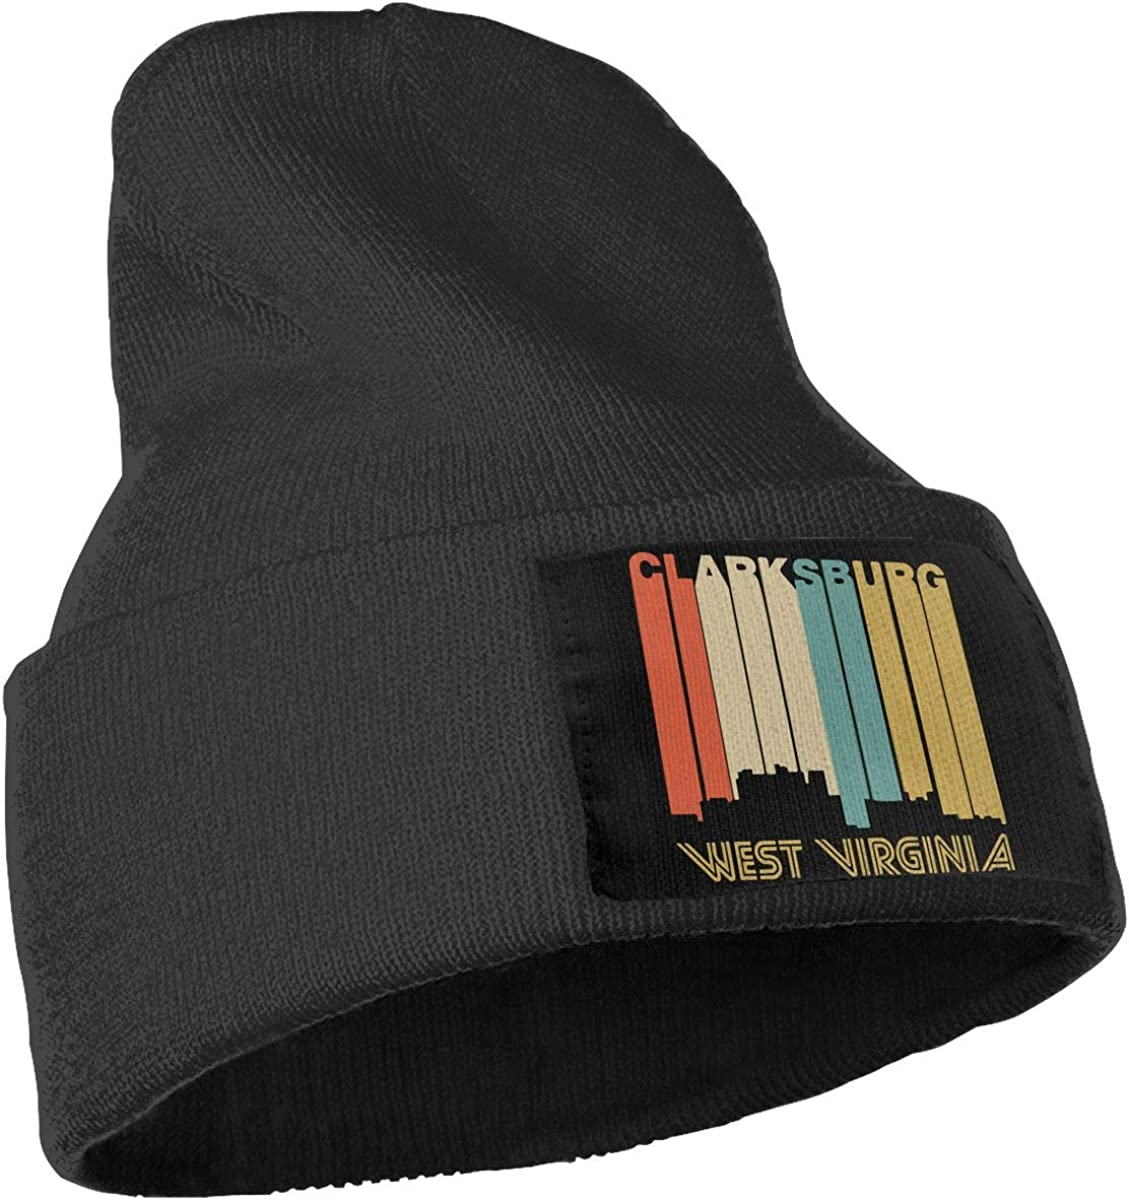 Retro 1970s Style Clarksburg West Virginia Skyline Skull Cap Men /& Women Knit Hats Stretchy /& Soft Beanie